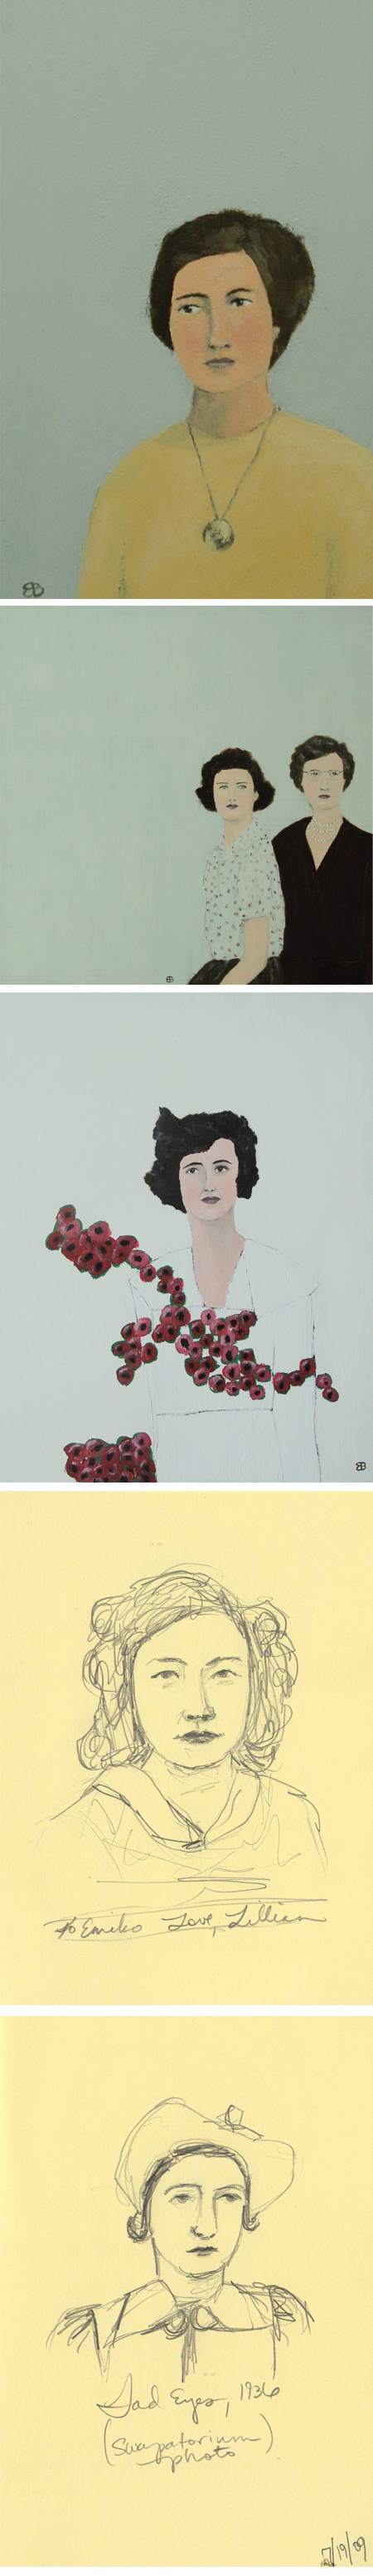 elizabethbauman